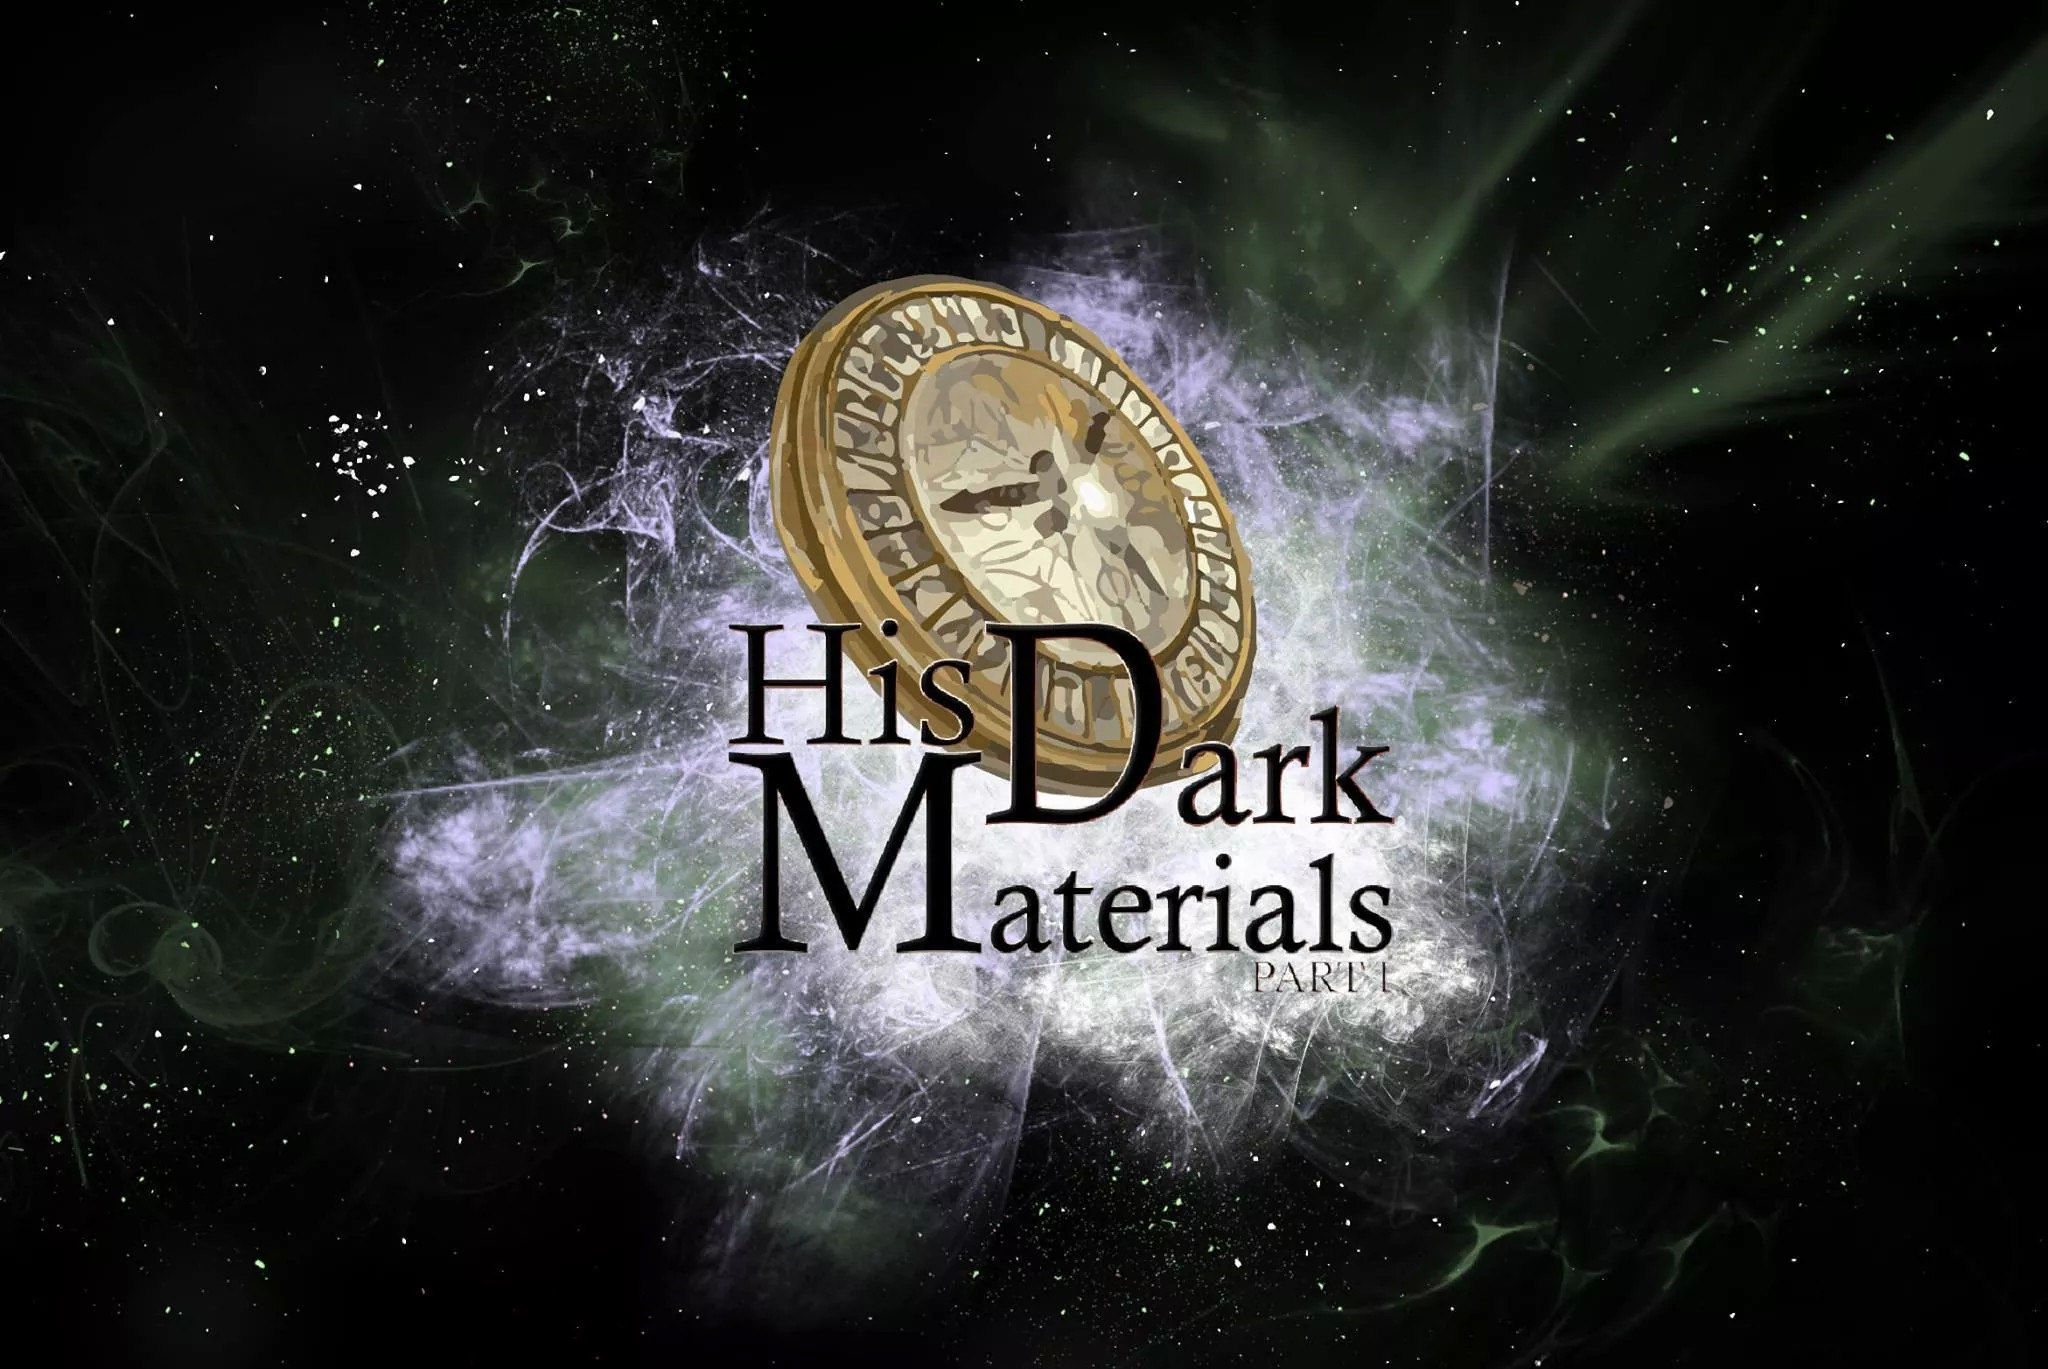 Review: His Dark Materials